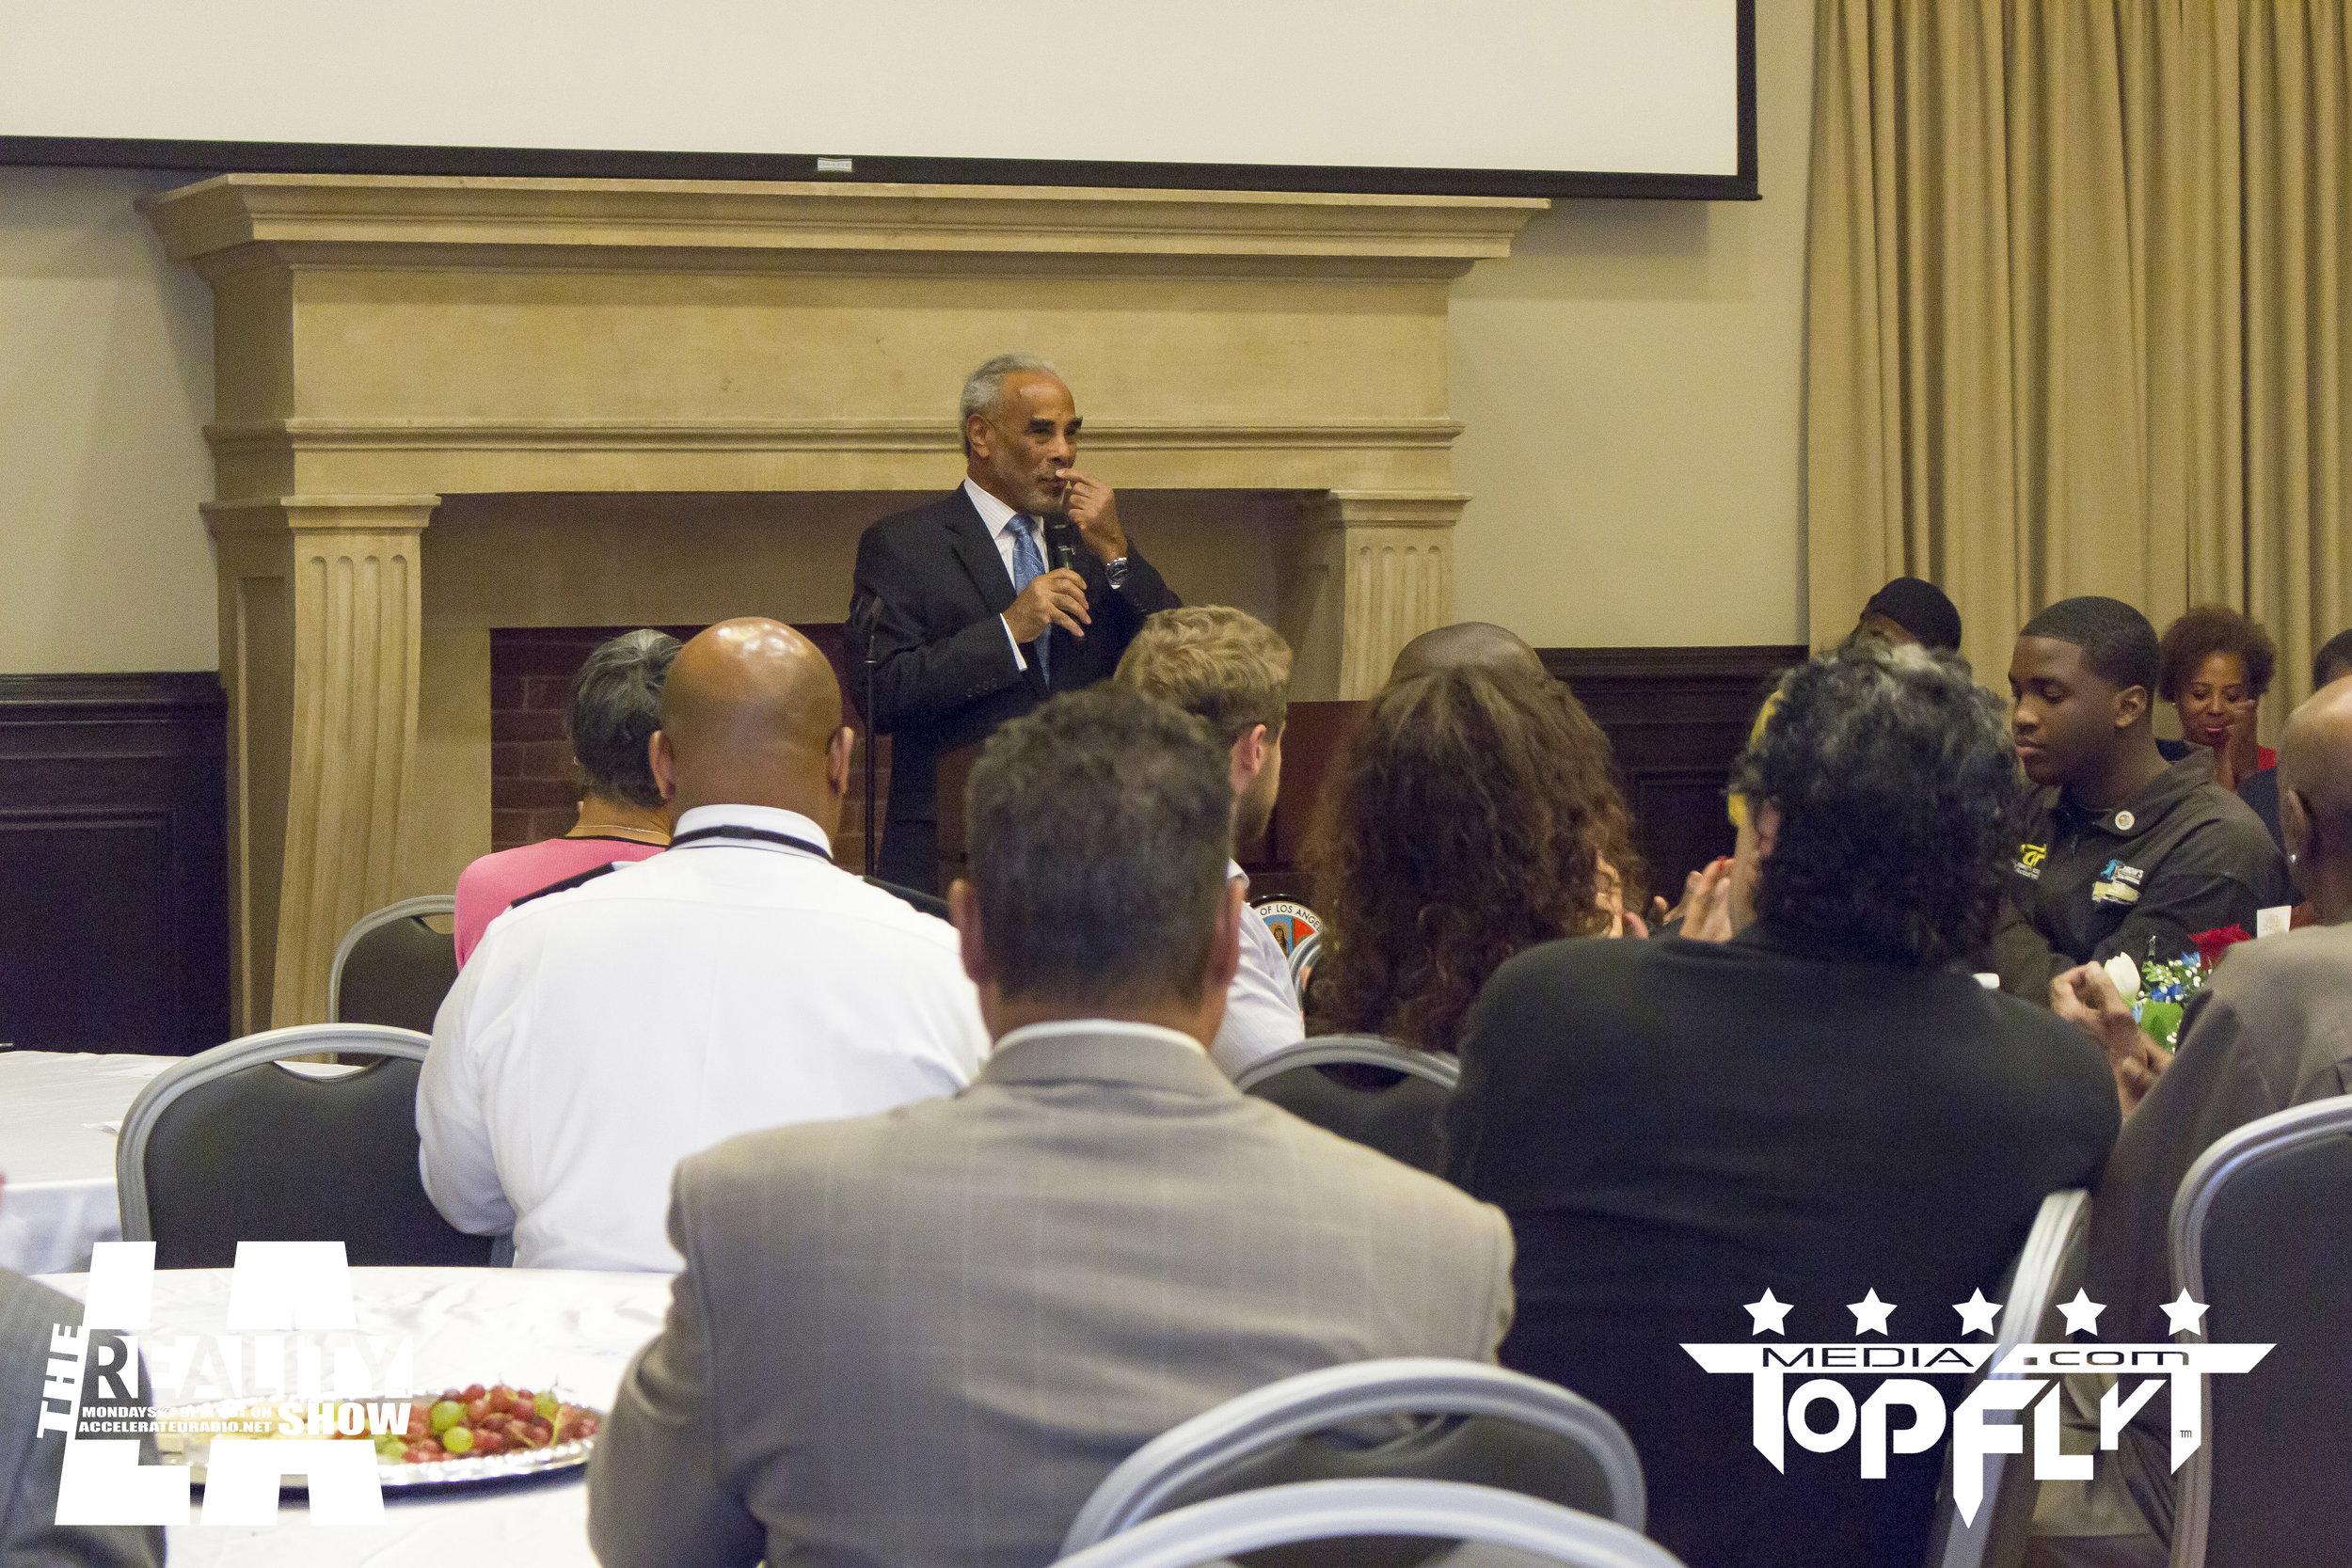 The Reality Show LA - Tuskegee Airmen 75th Anniversary VIP Reception_82.jpg